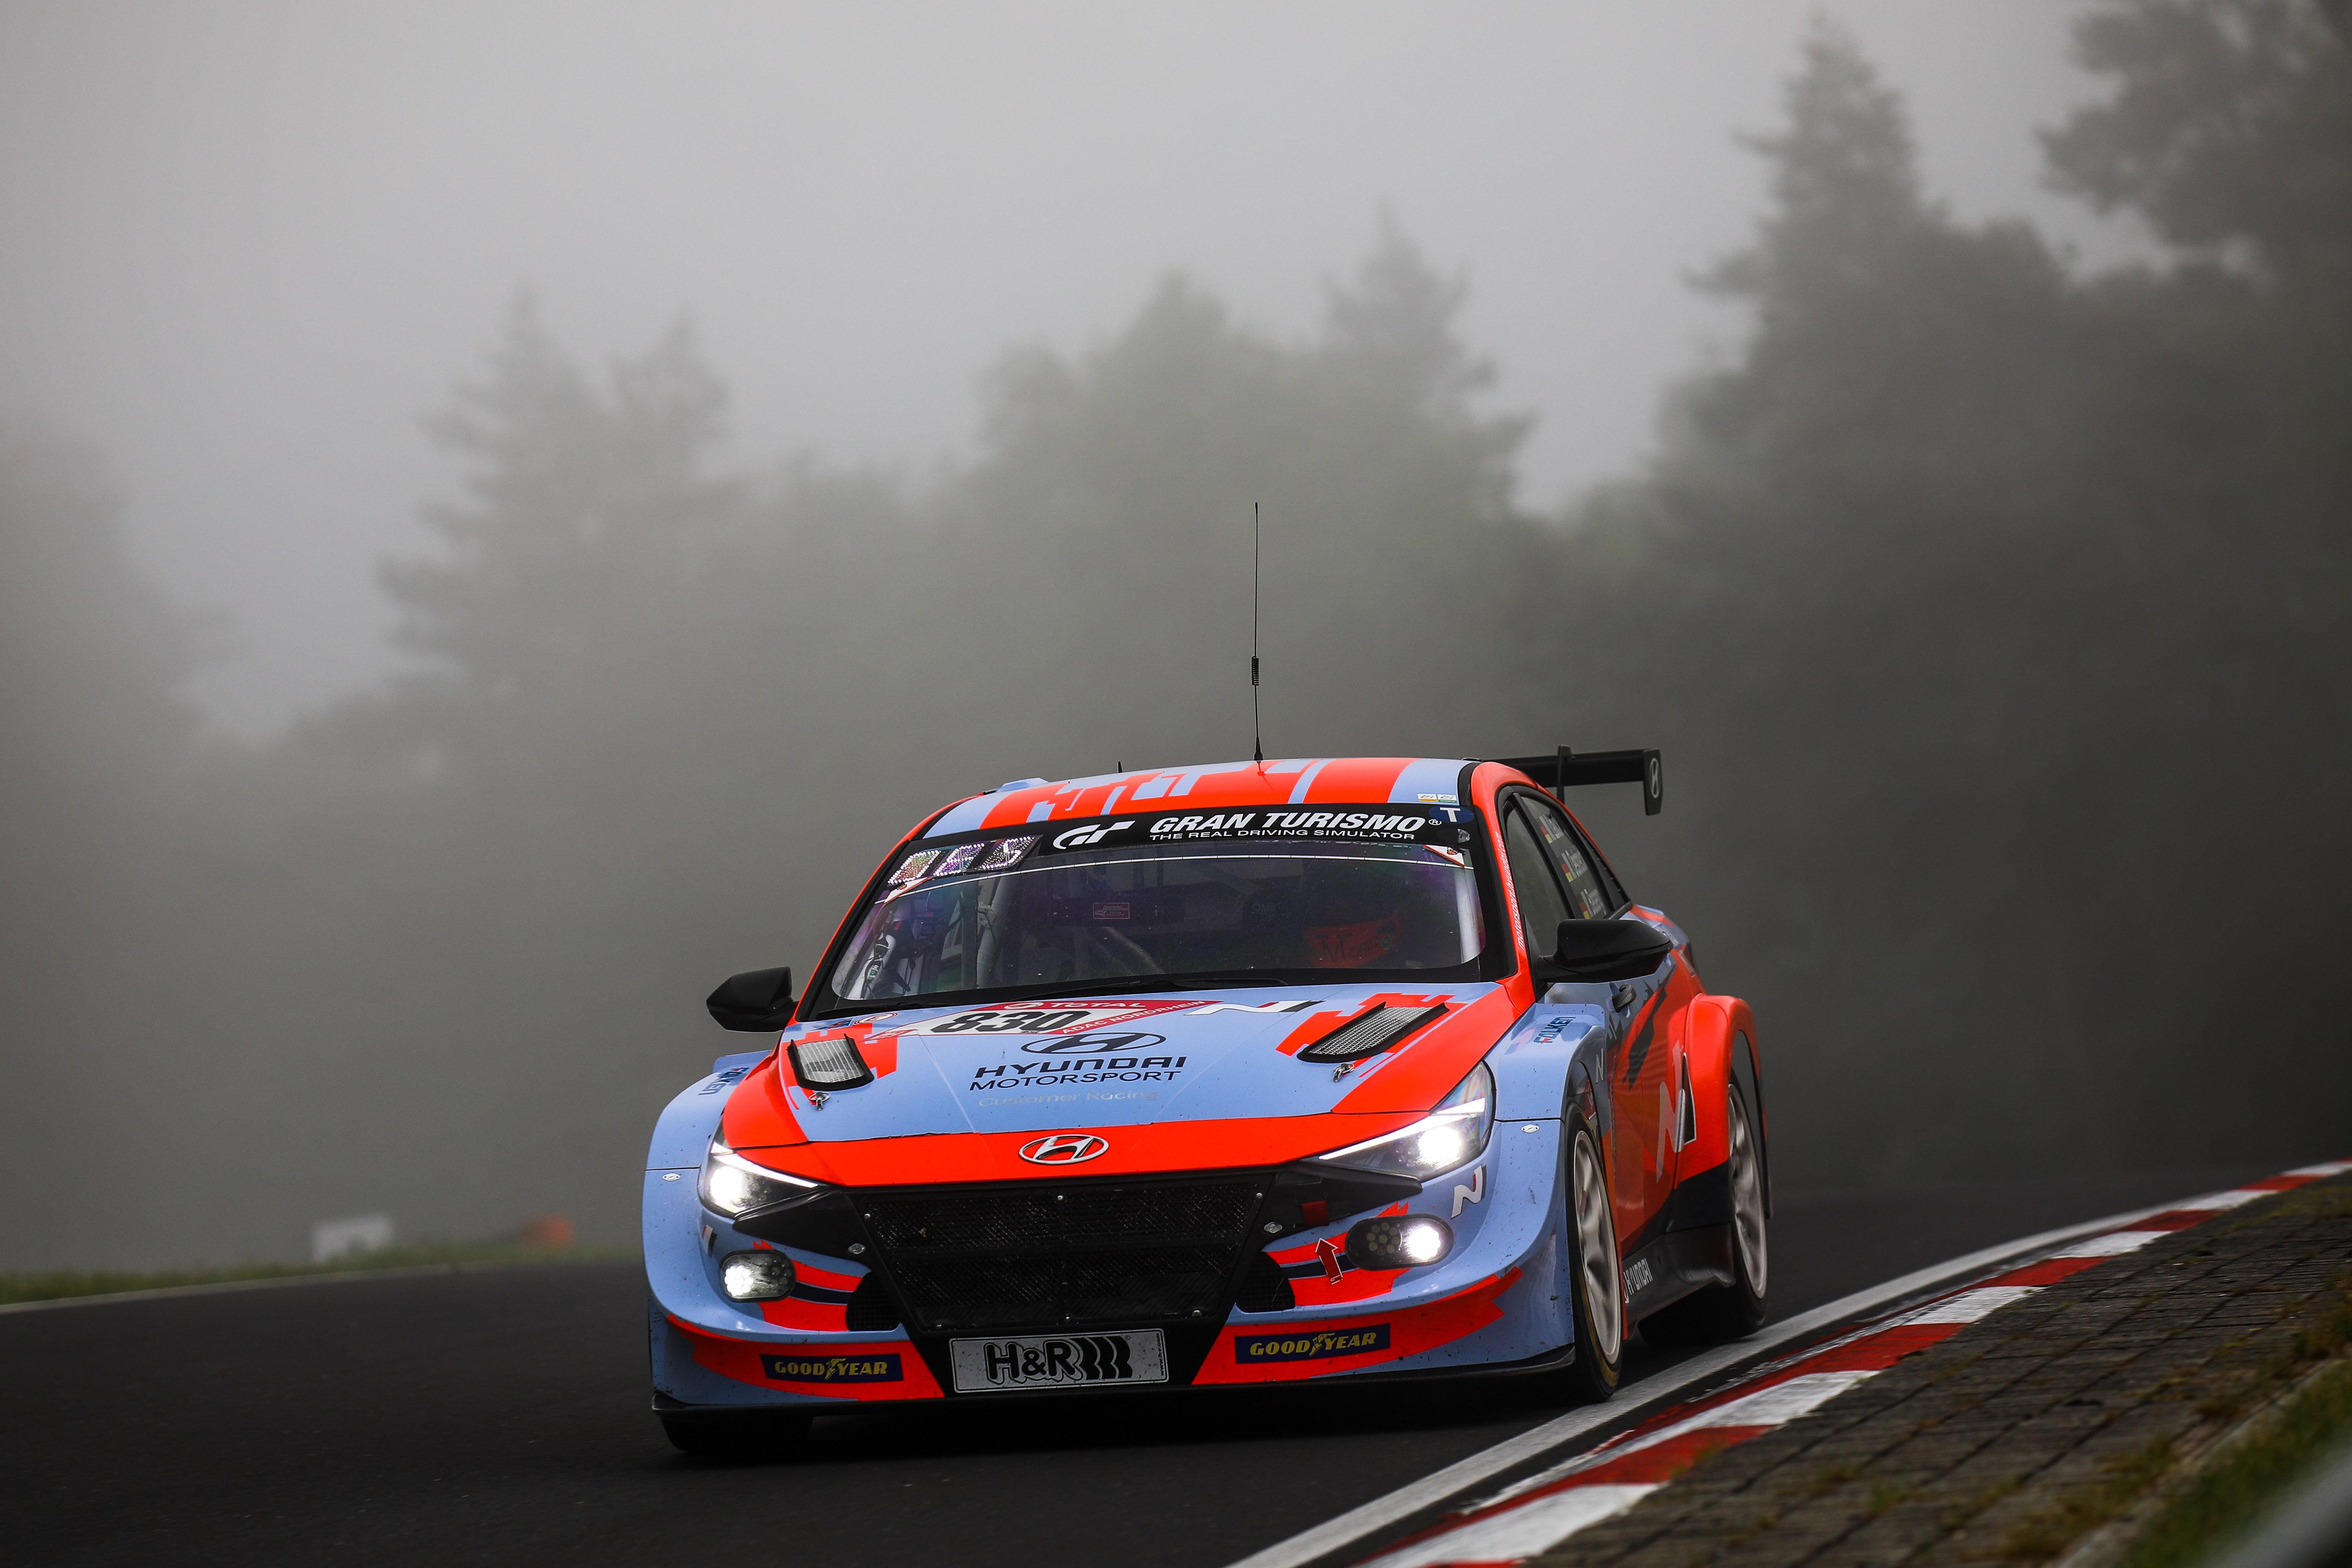 Hyundai Elantra N TCR - 2021 Nürburgring 24 Hours